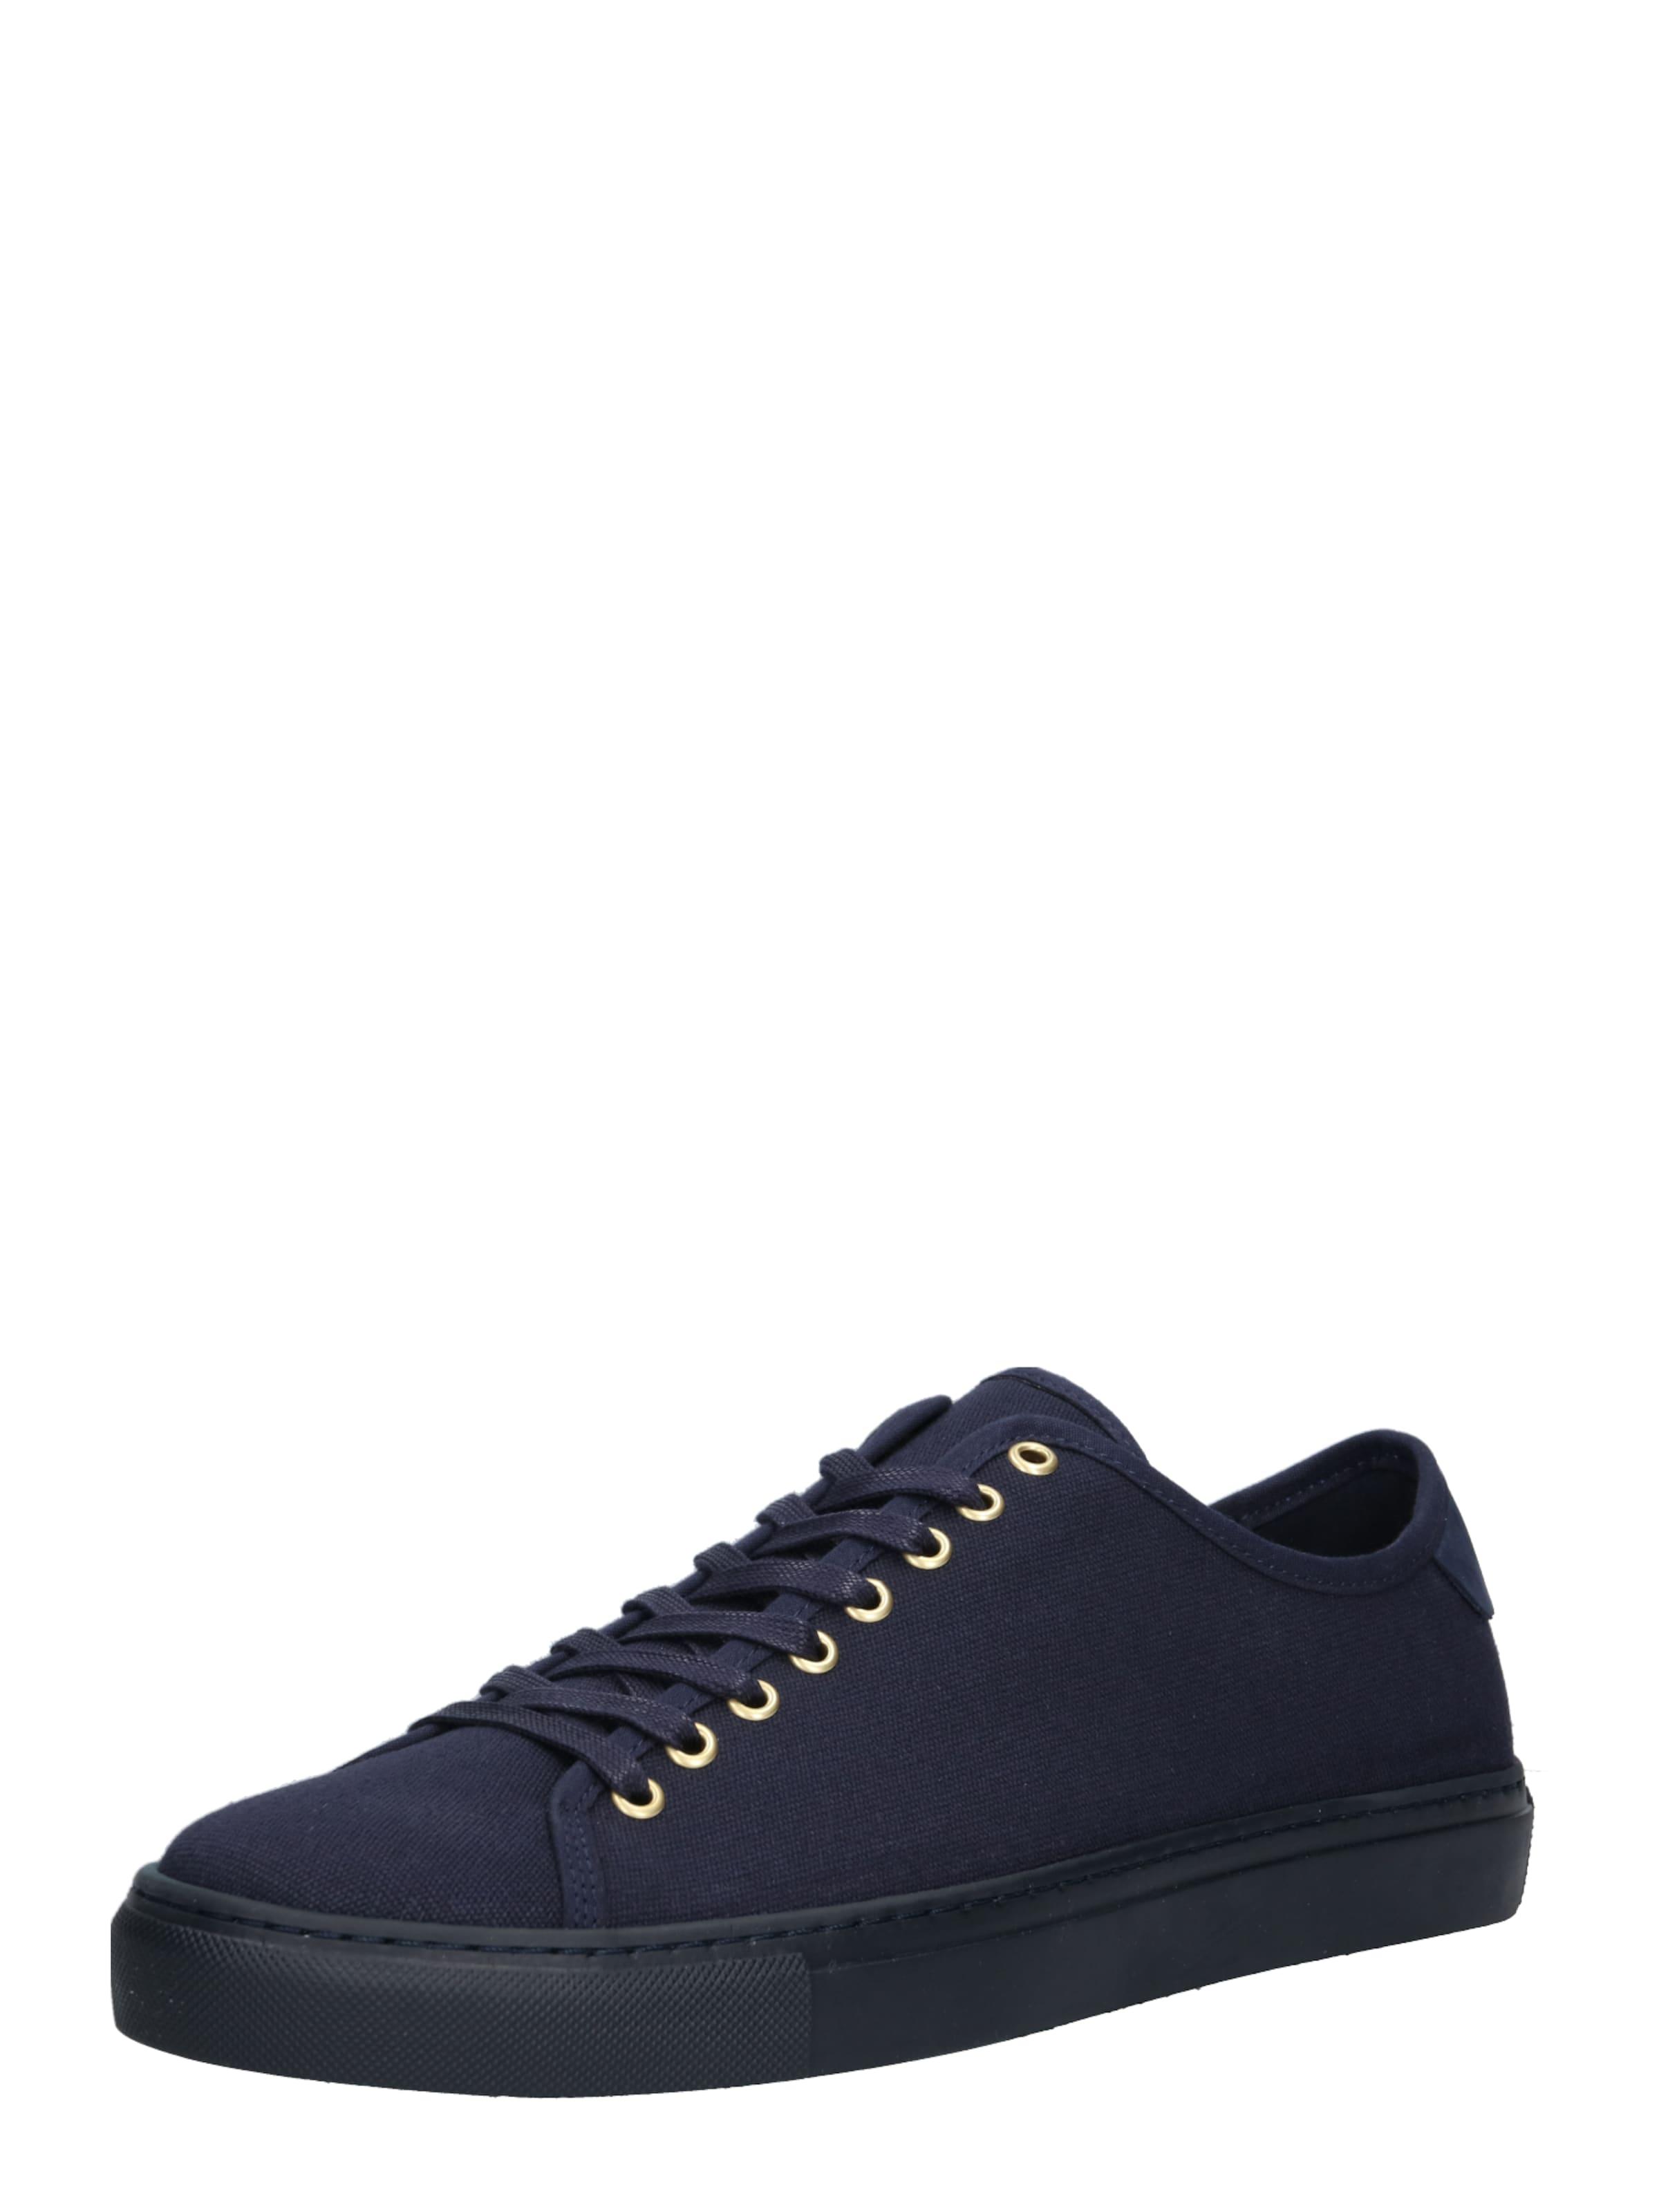 Filippa Sneaker Navy K 'mMorgan In Canvas' VUqSzpM